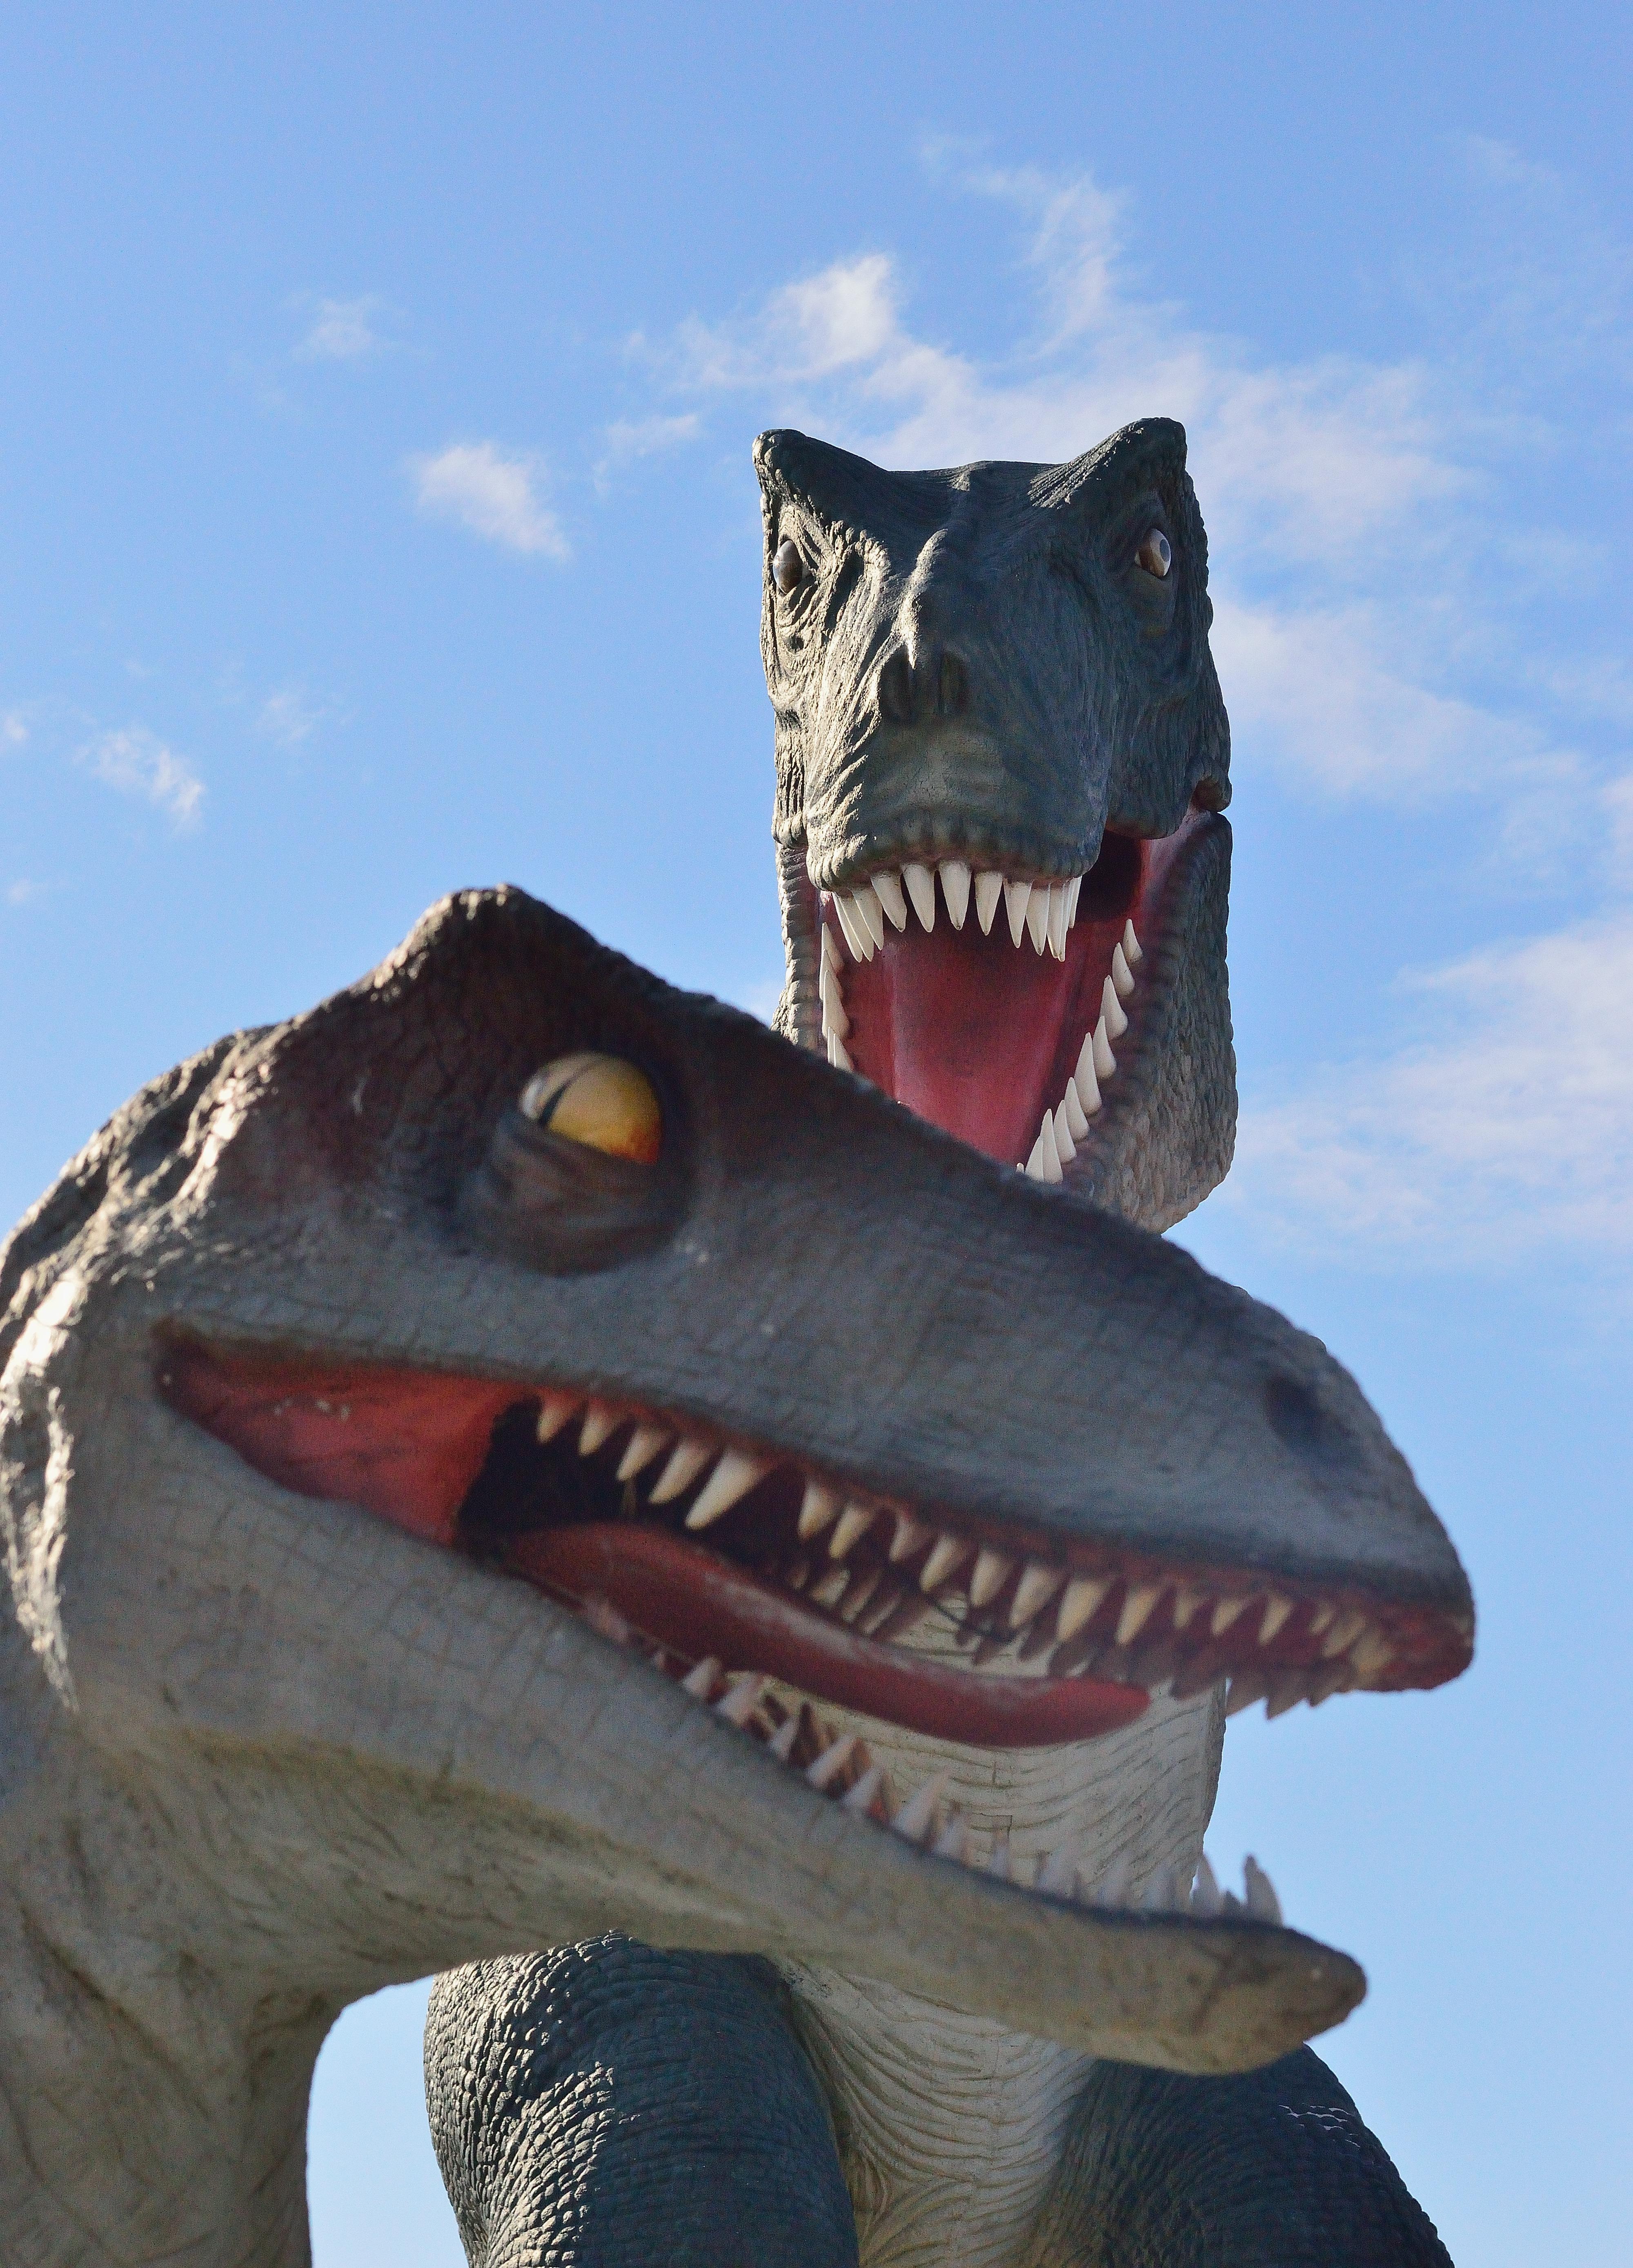 Images gratuites touristique reptile attraction - Dessin dinosaure t rex ...